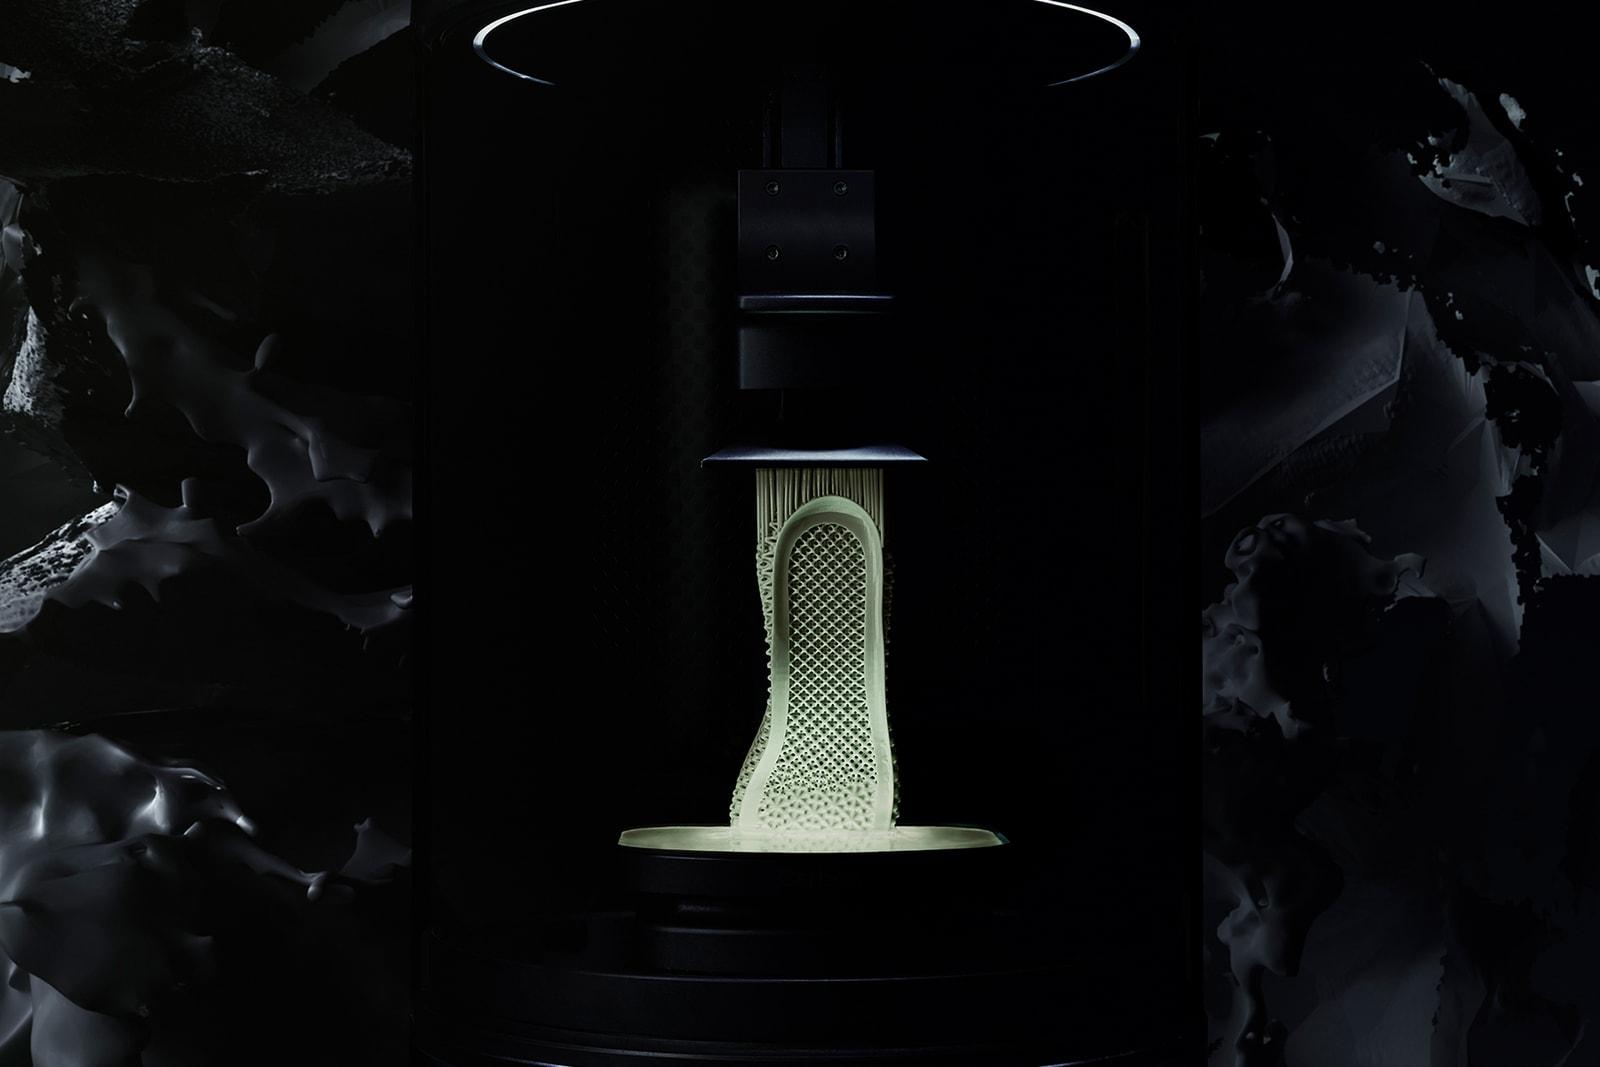 adidas よりスニーカー史を更新する異次元構造ミッドソール搭載の Alphaedge 4D が登場 世界有数の3Dプリントメーカー「Carbon」とチームアップし、最先端テクノロジーを駆使した時代を変える名作モデルが完成